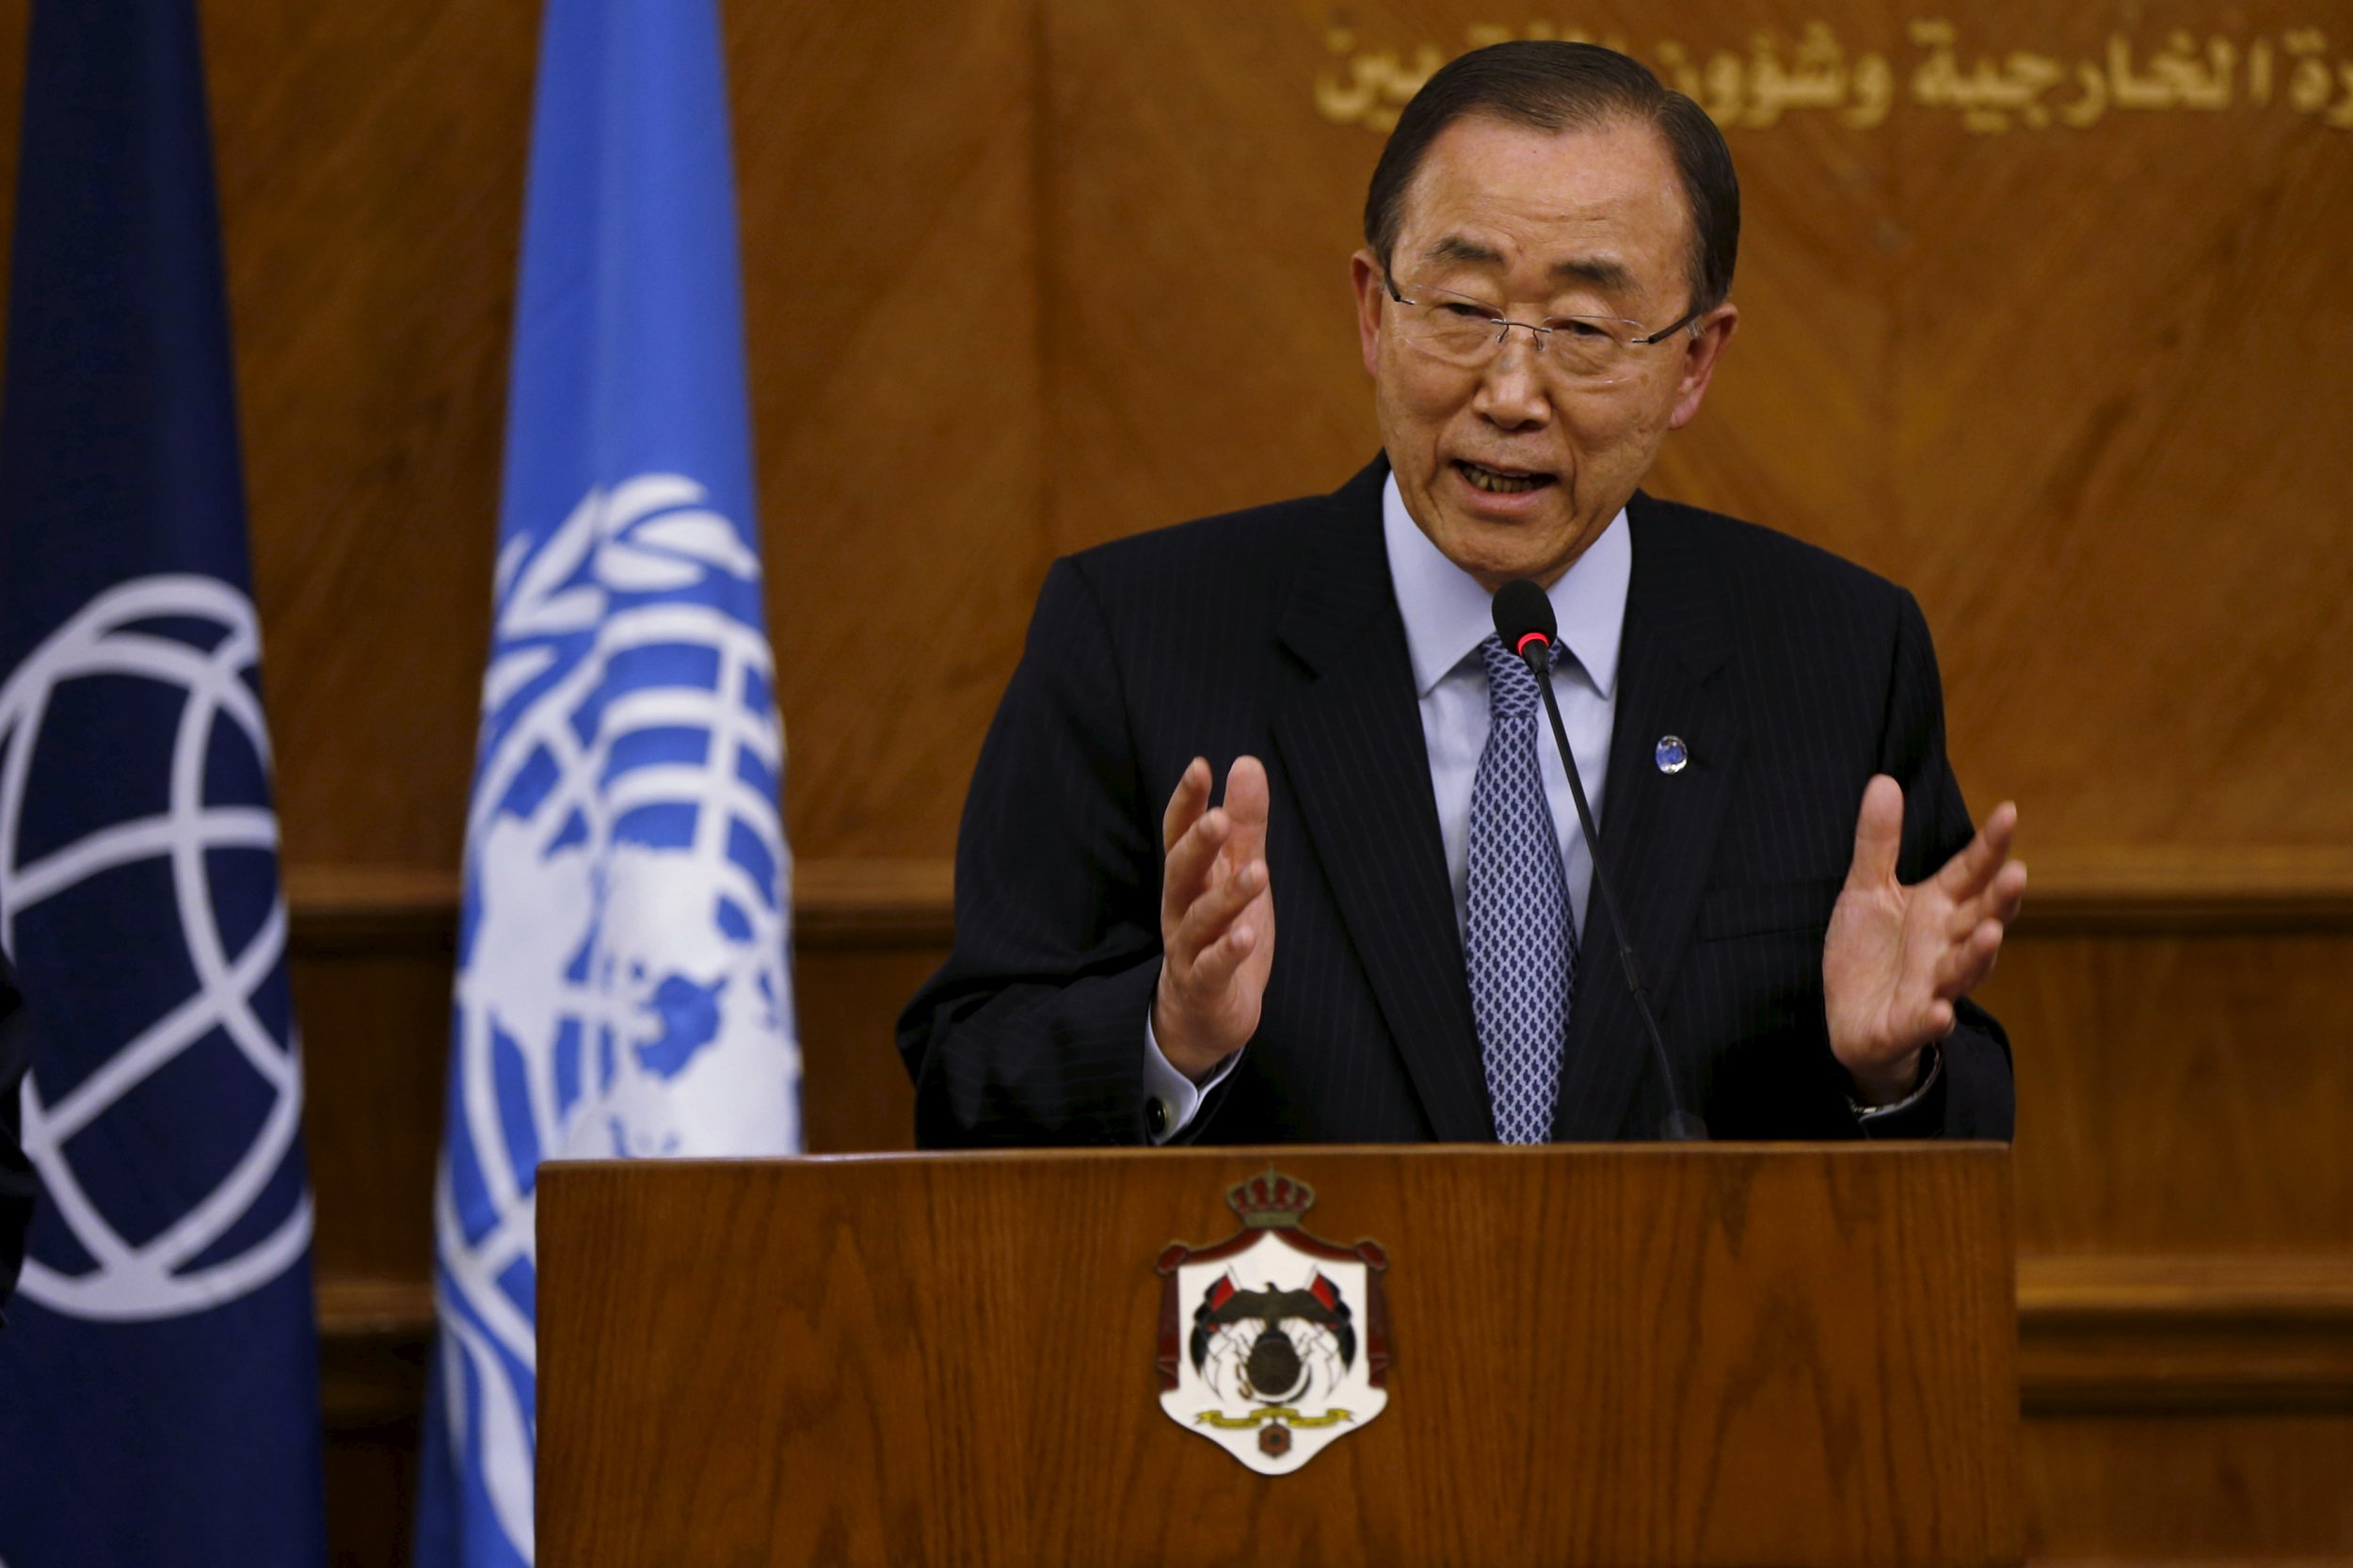 U.N. Secretary-General Ban Ki-moon addresses a press conference in Amman, Jordan.